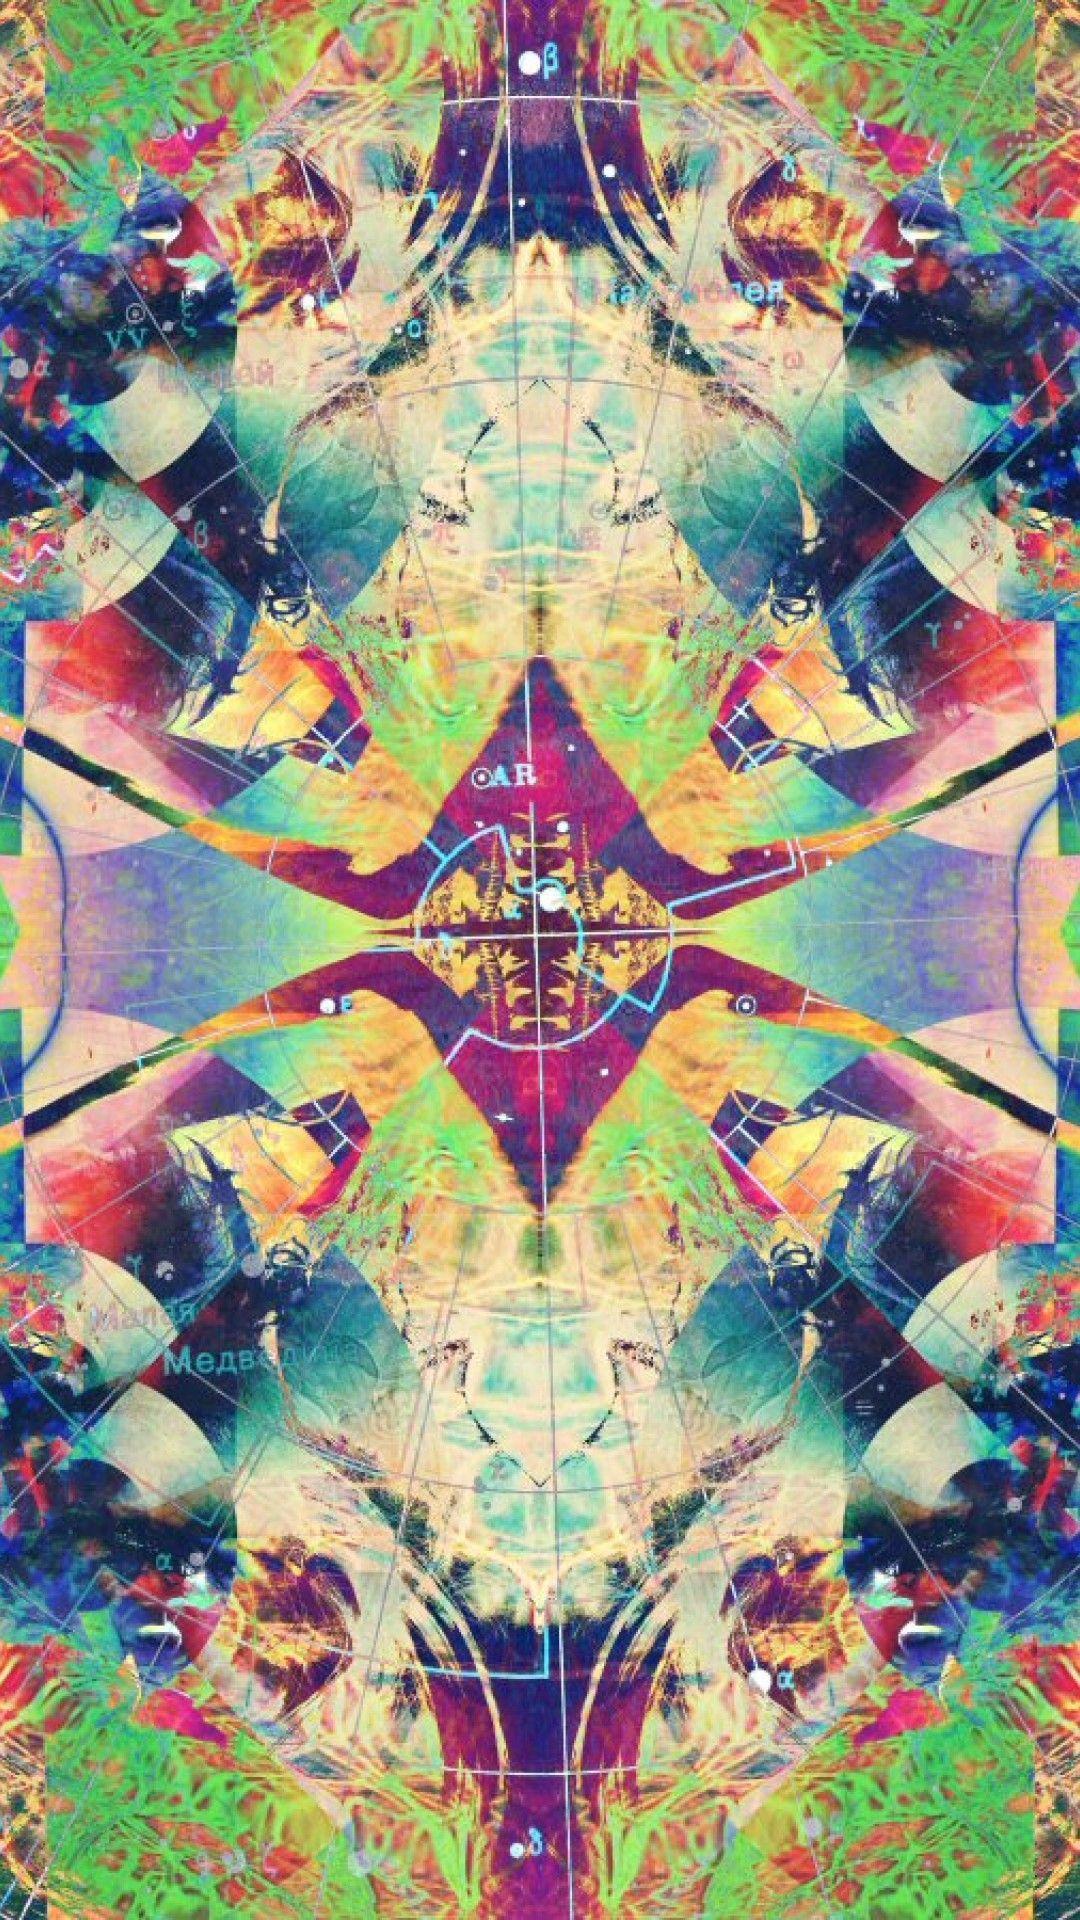 Trippy phone background